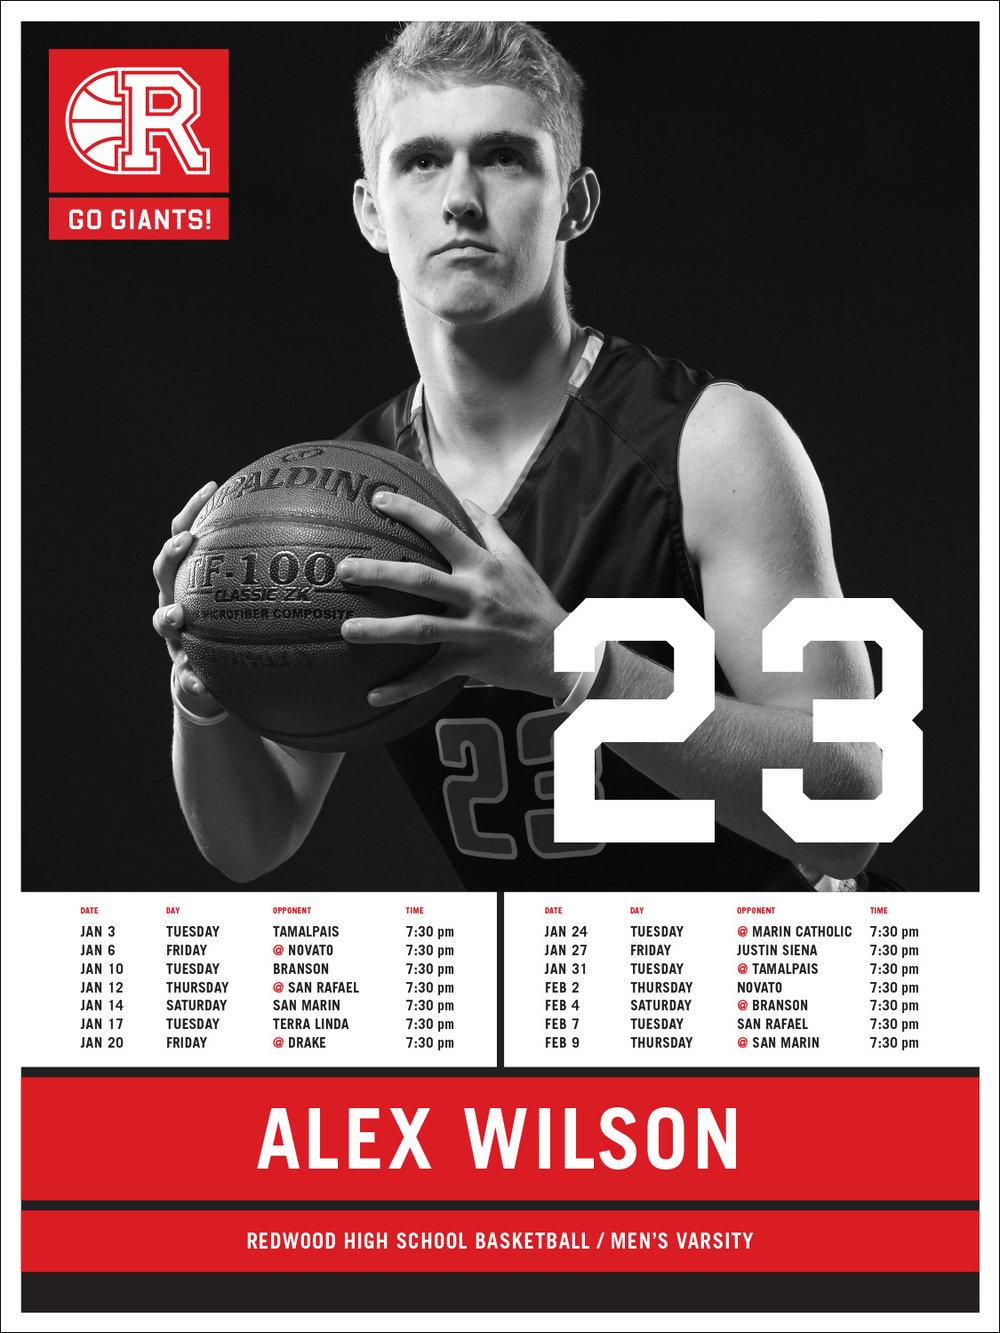 Redwood High School Basketball / Varsity Teams